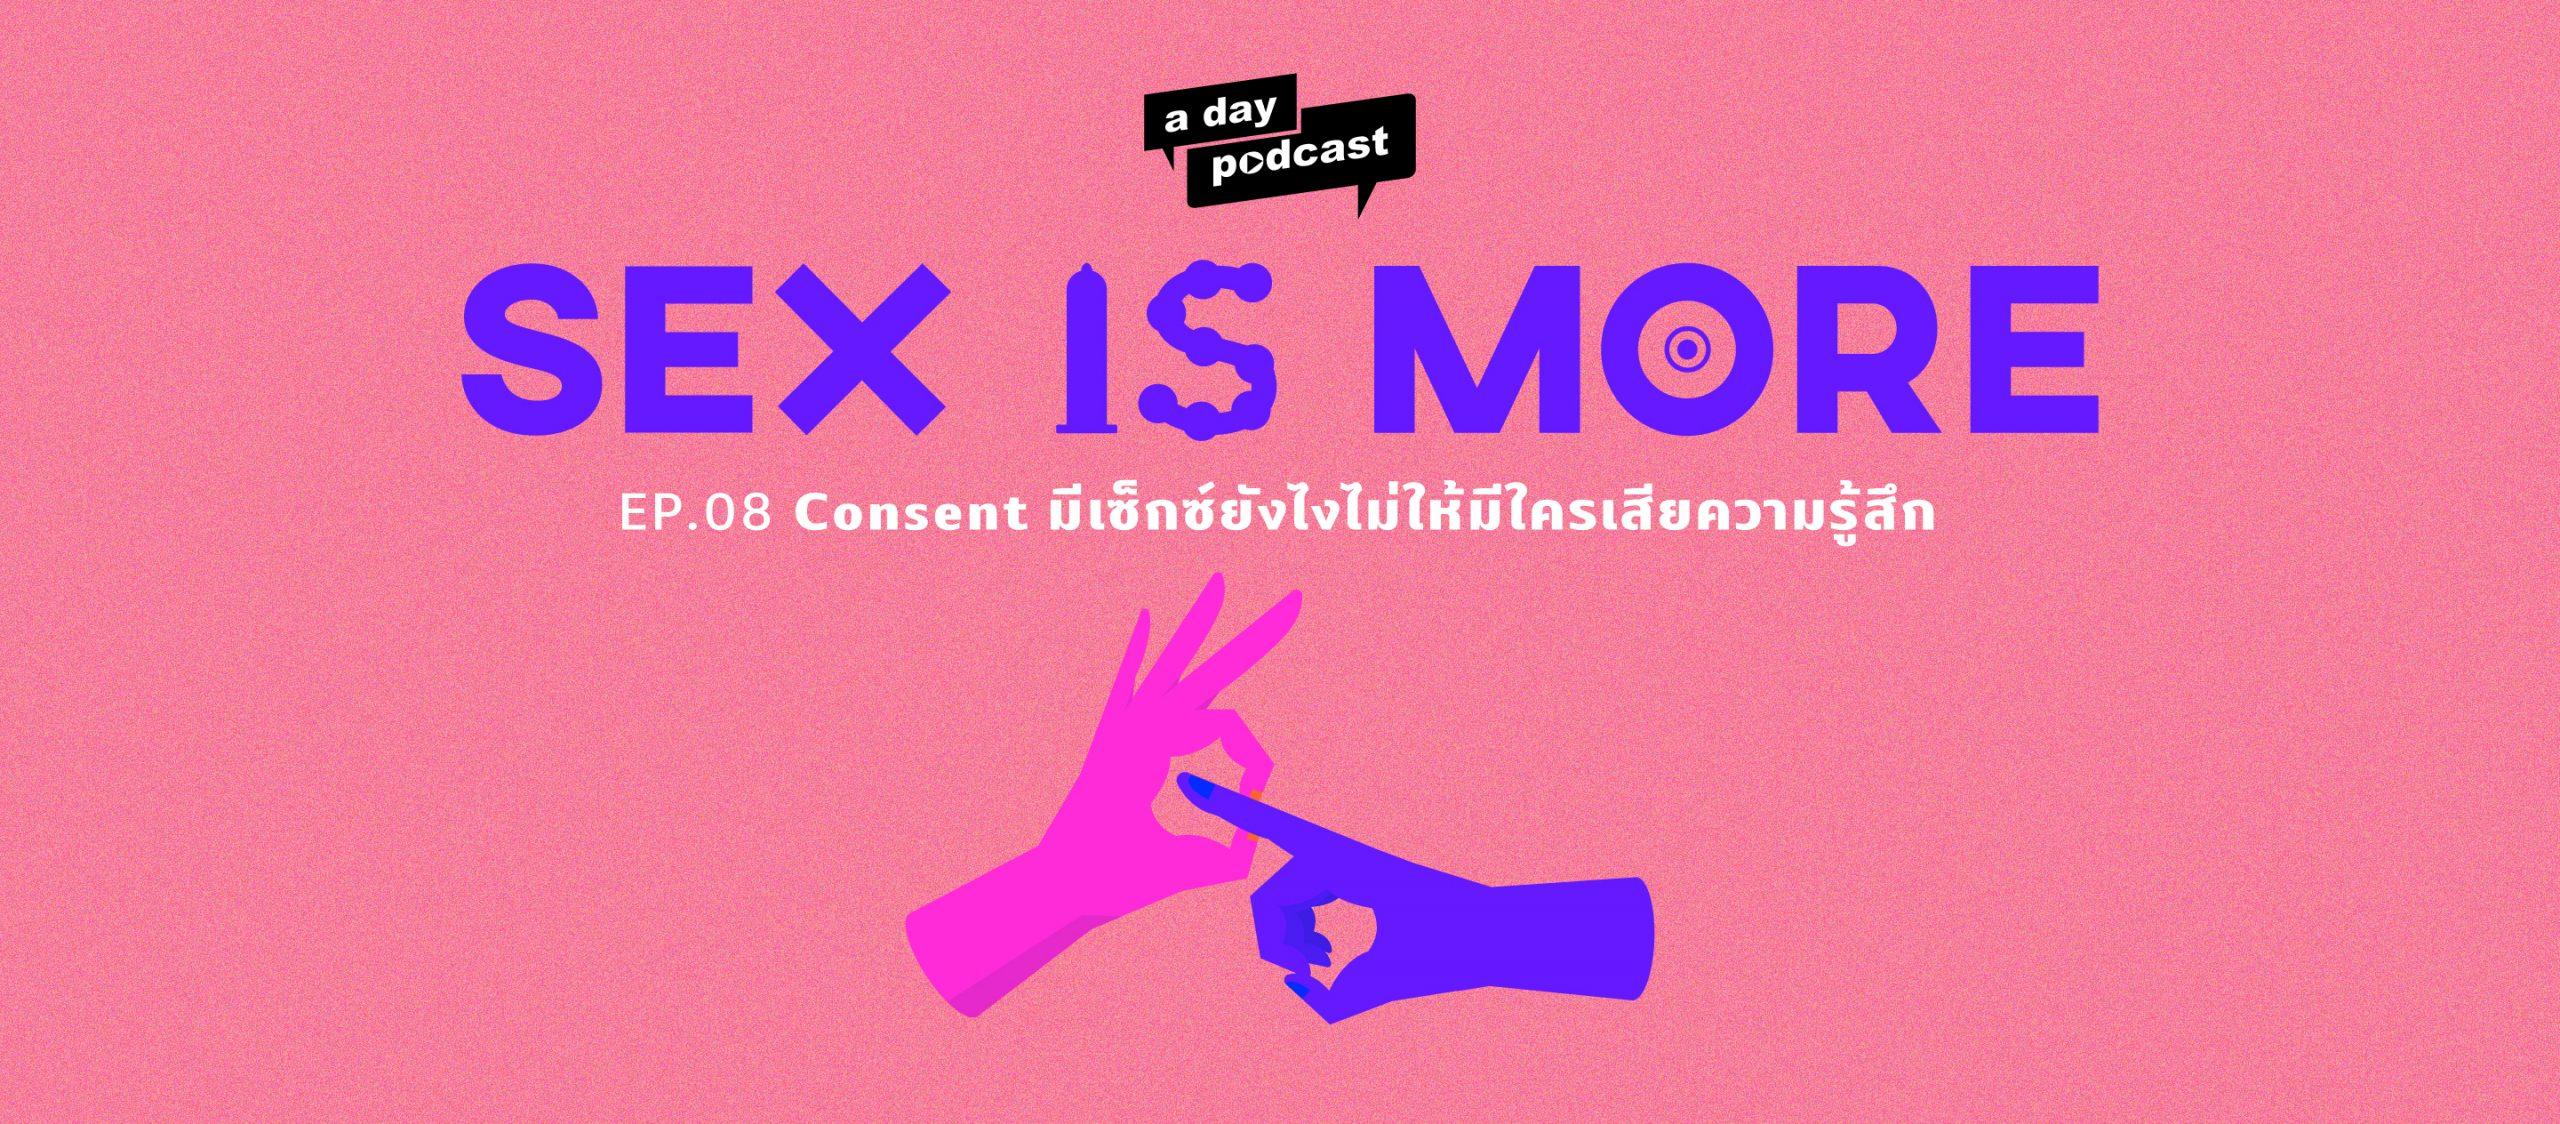 Sex is More EP.08 Consent มีเซ็กซ์ยังไงไม่ให้มีใครเสียความรู้สึก